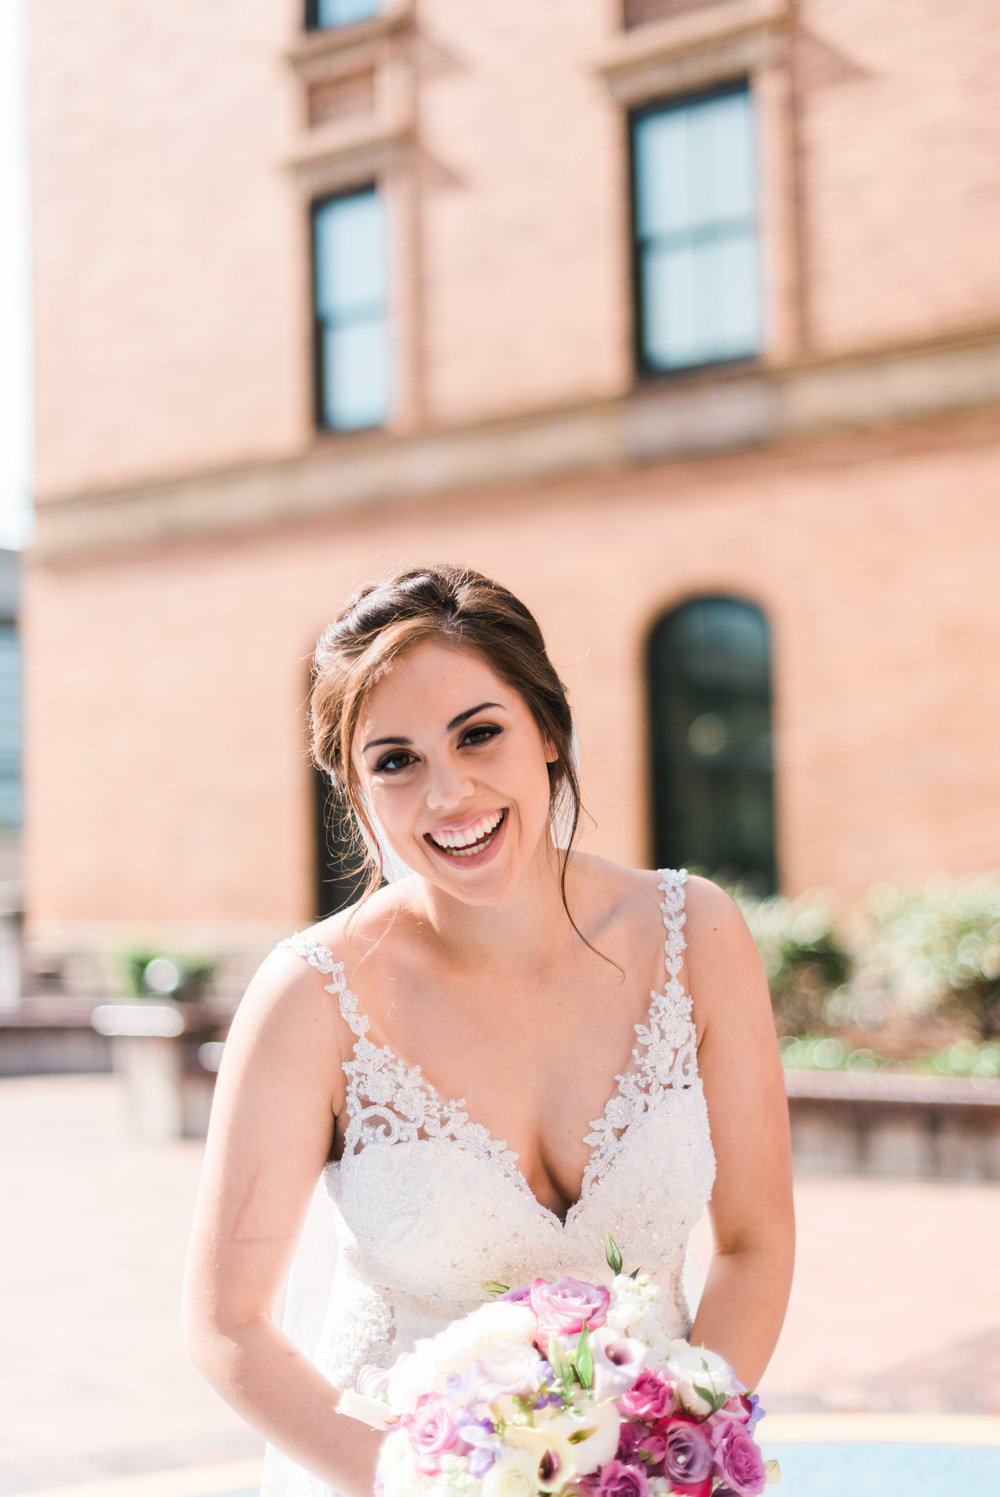 Brooke Summers Photography | Emily + John